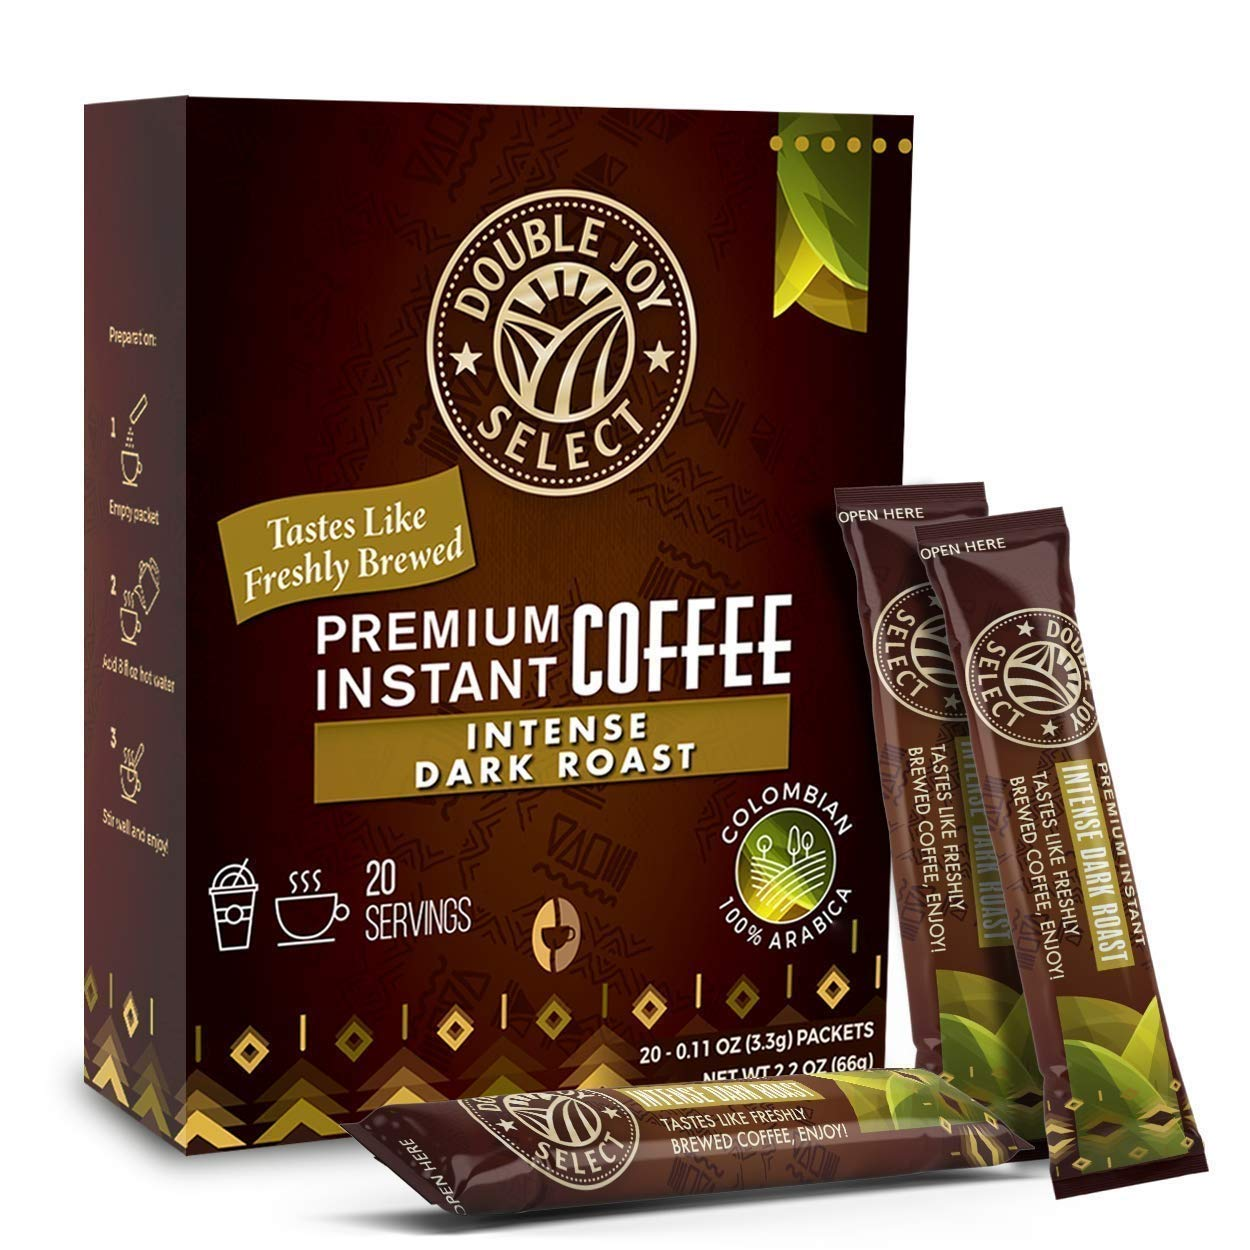 Instant Coffee Packets - Instant coffee singles Tastes Like Freshly Brewed (Intense Dark Roast, 20 Packets)